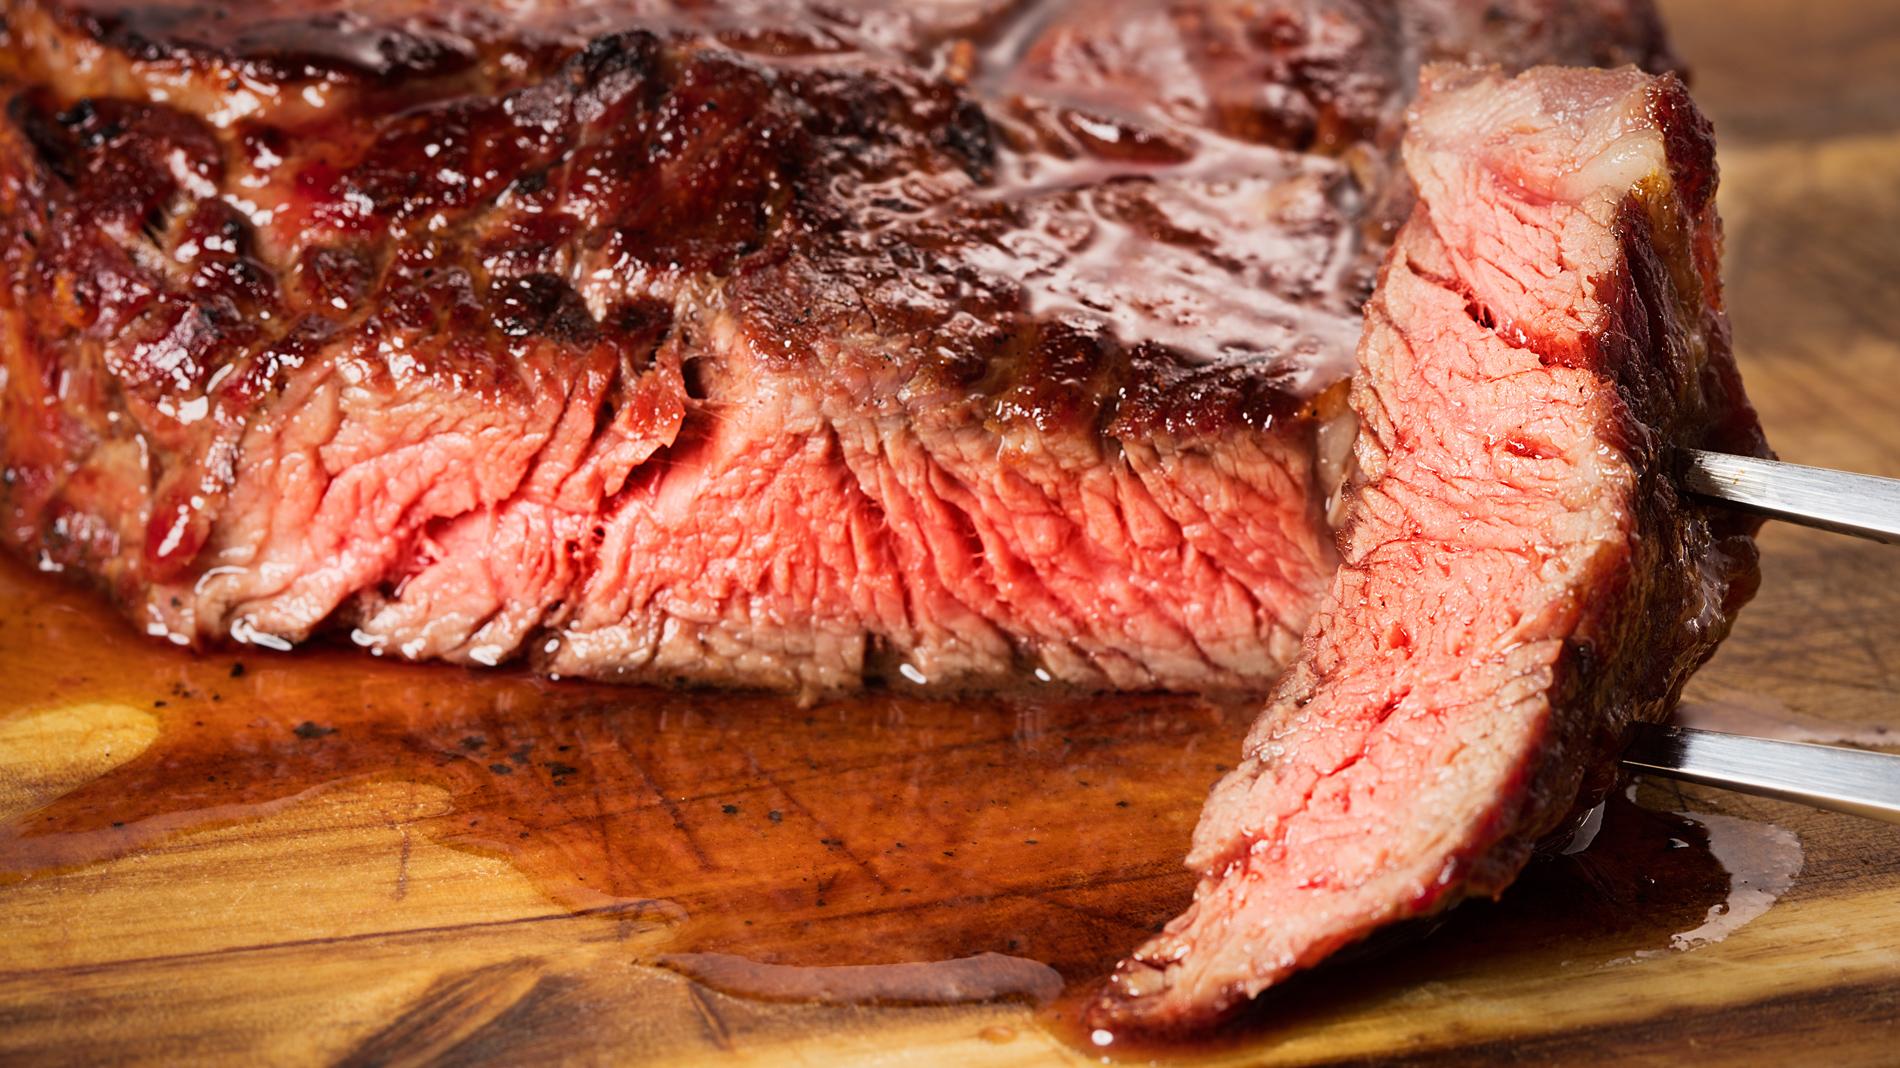 a rib-eye steak